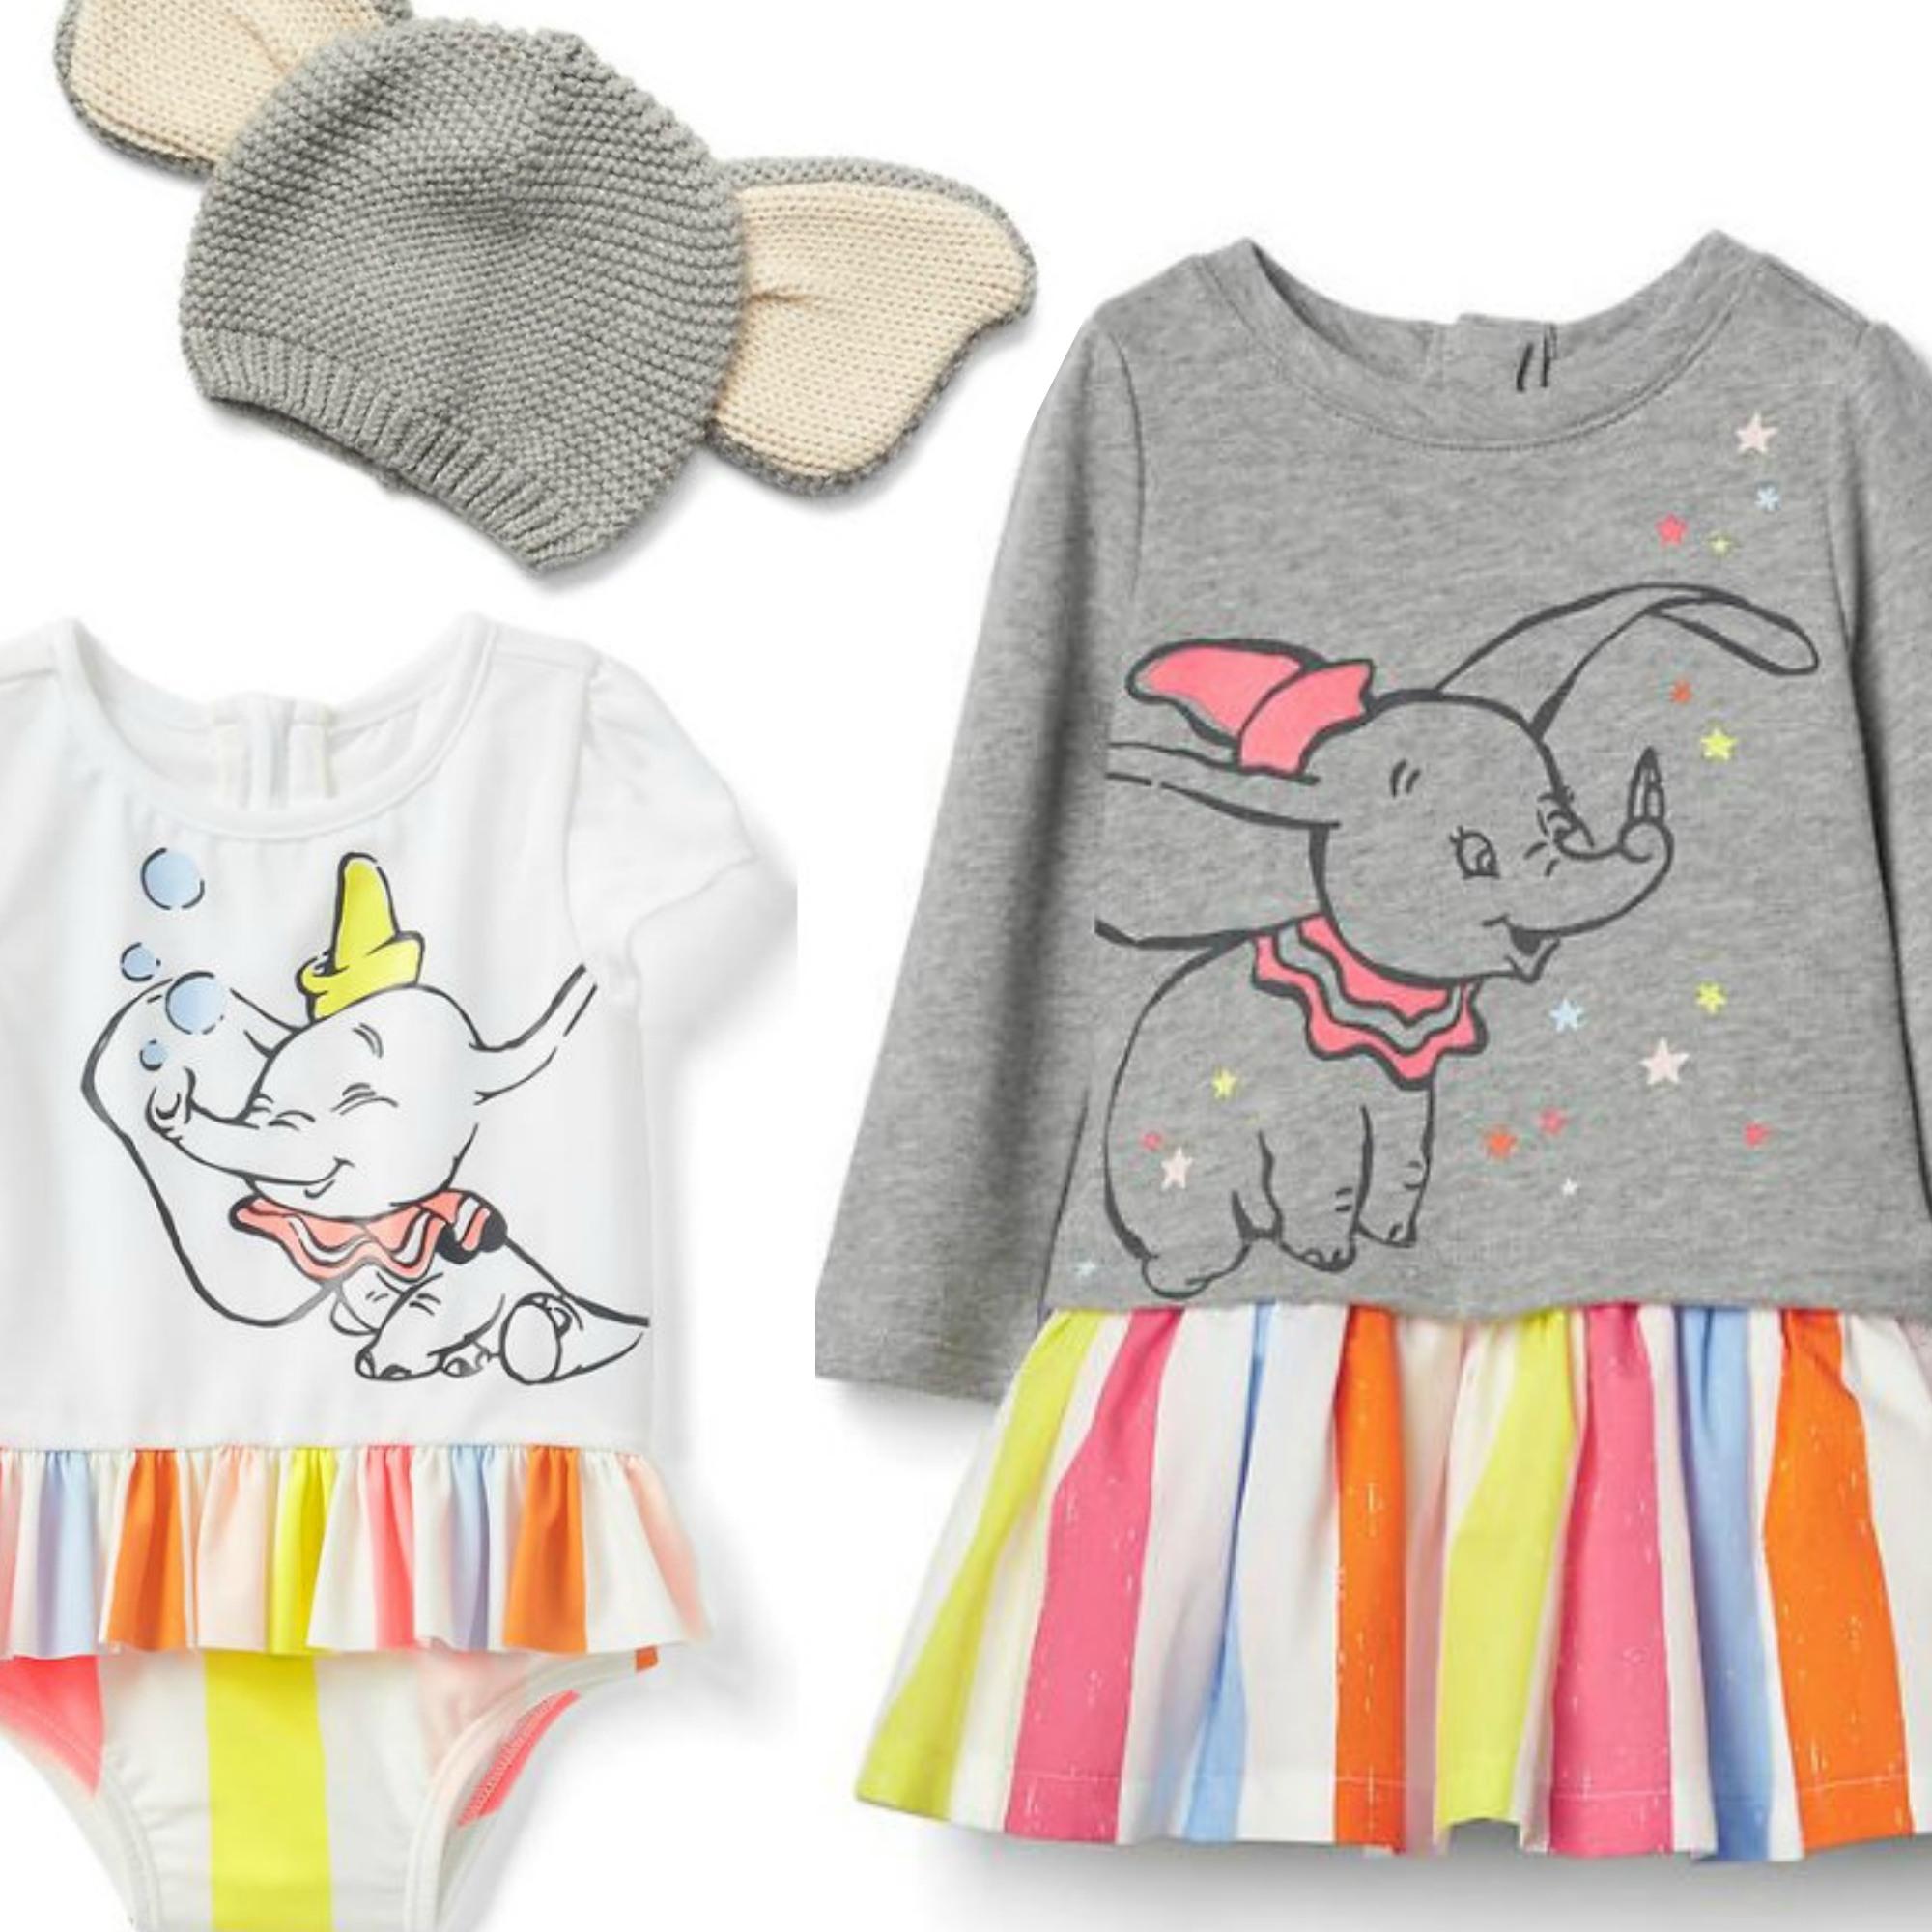 Shopping For Kids Disney Clothing